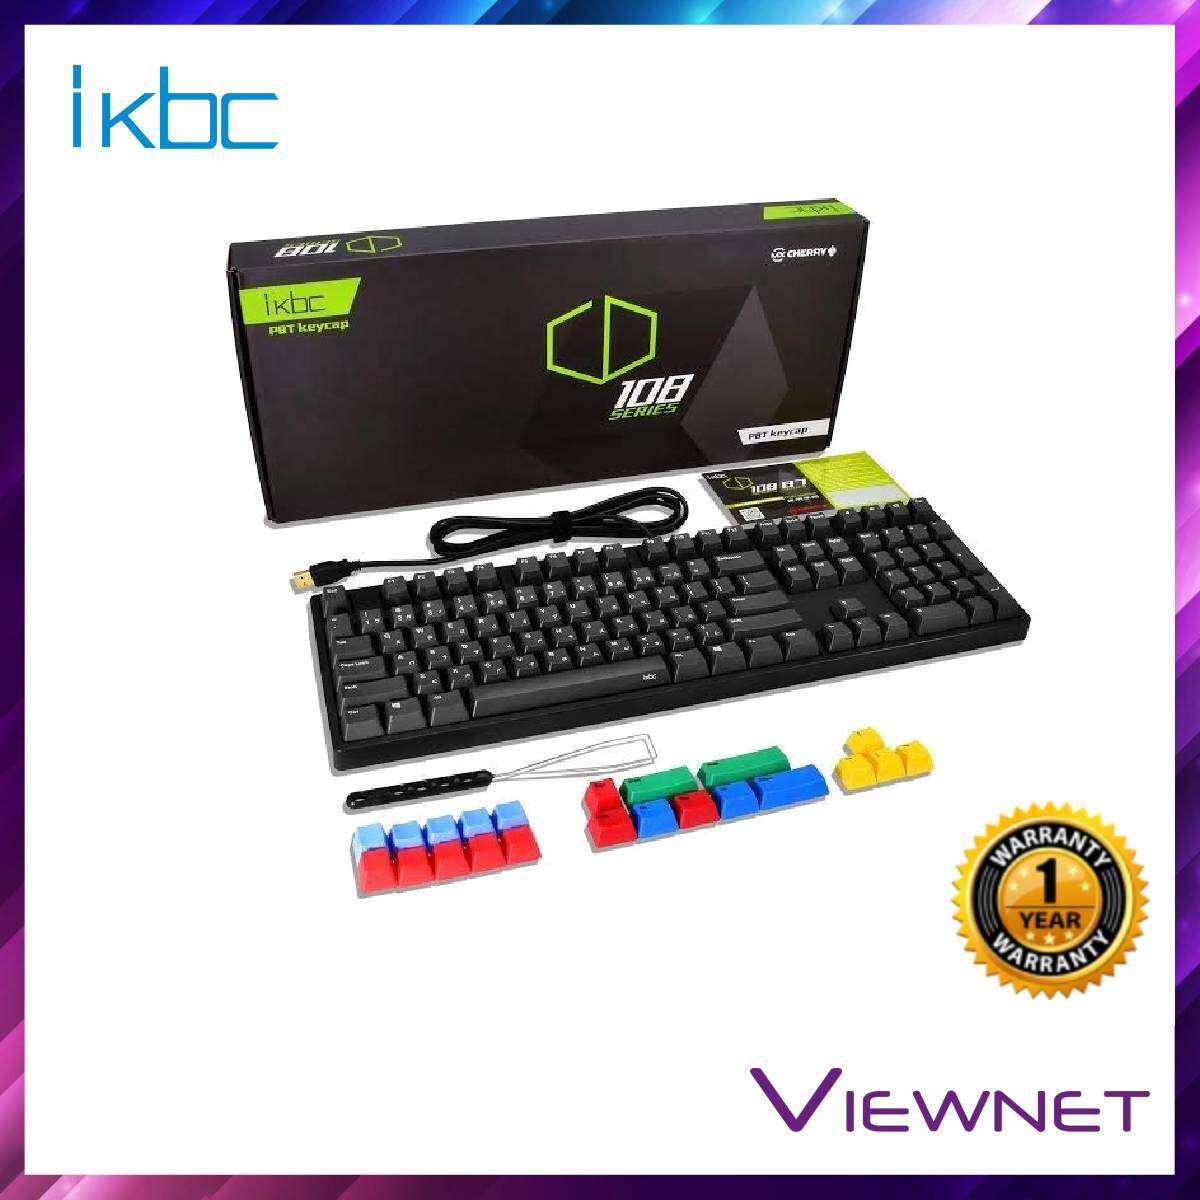 IKBC Gaming Wired CD108 (Brown/BLue/Red Switch) Black Keyboard